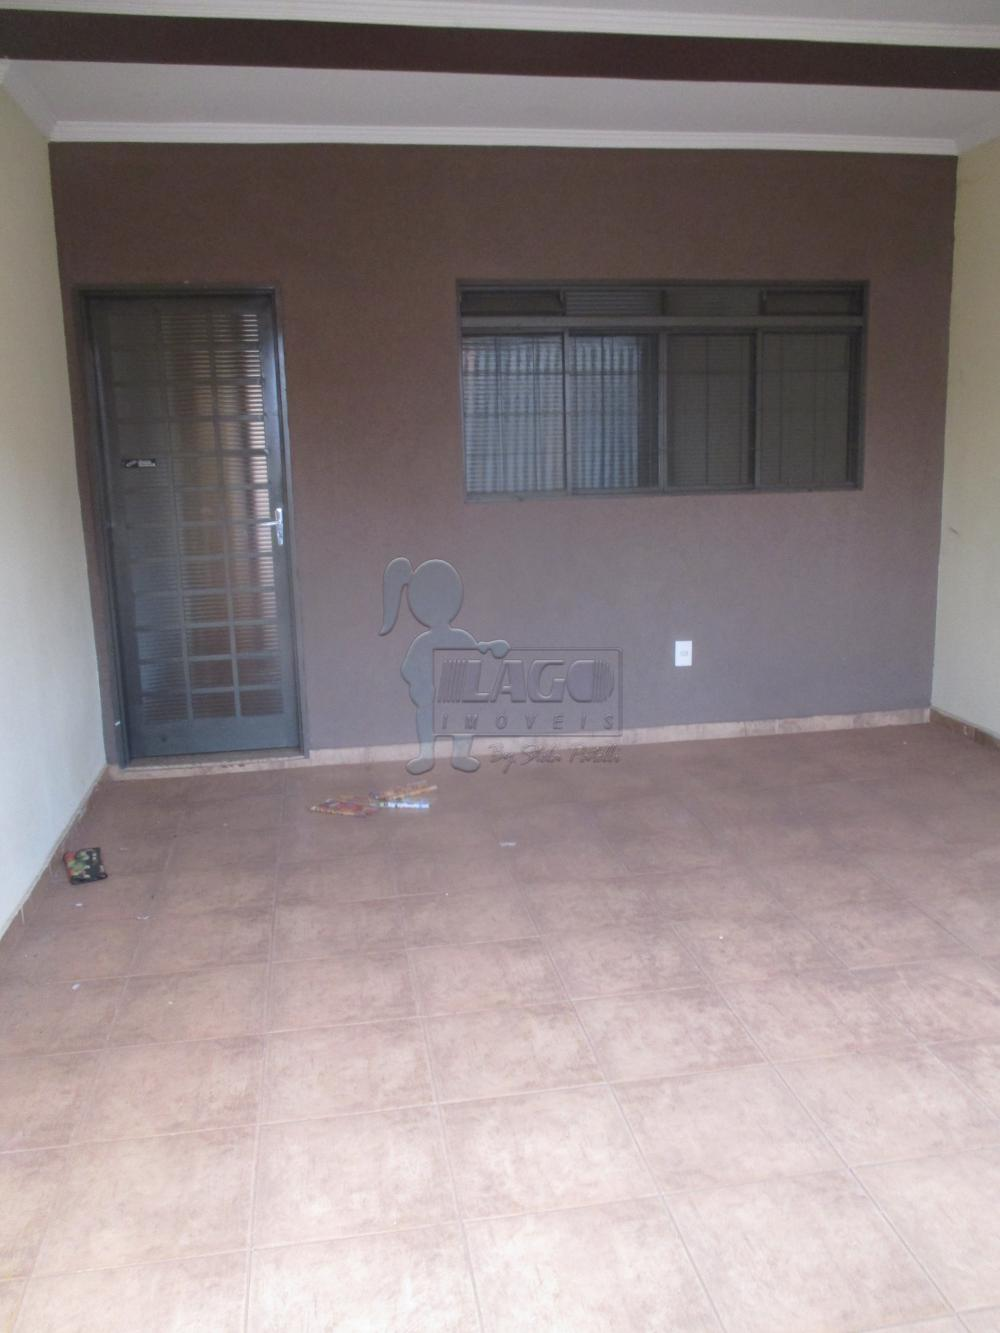 Ribeirao Preto Casa Locacao R$ 1.200,00 3 Dormitorios 1 Suite Area do terreno 180.00m2 Area construida 90.00m2